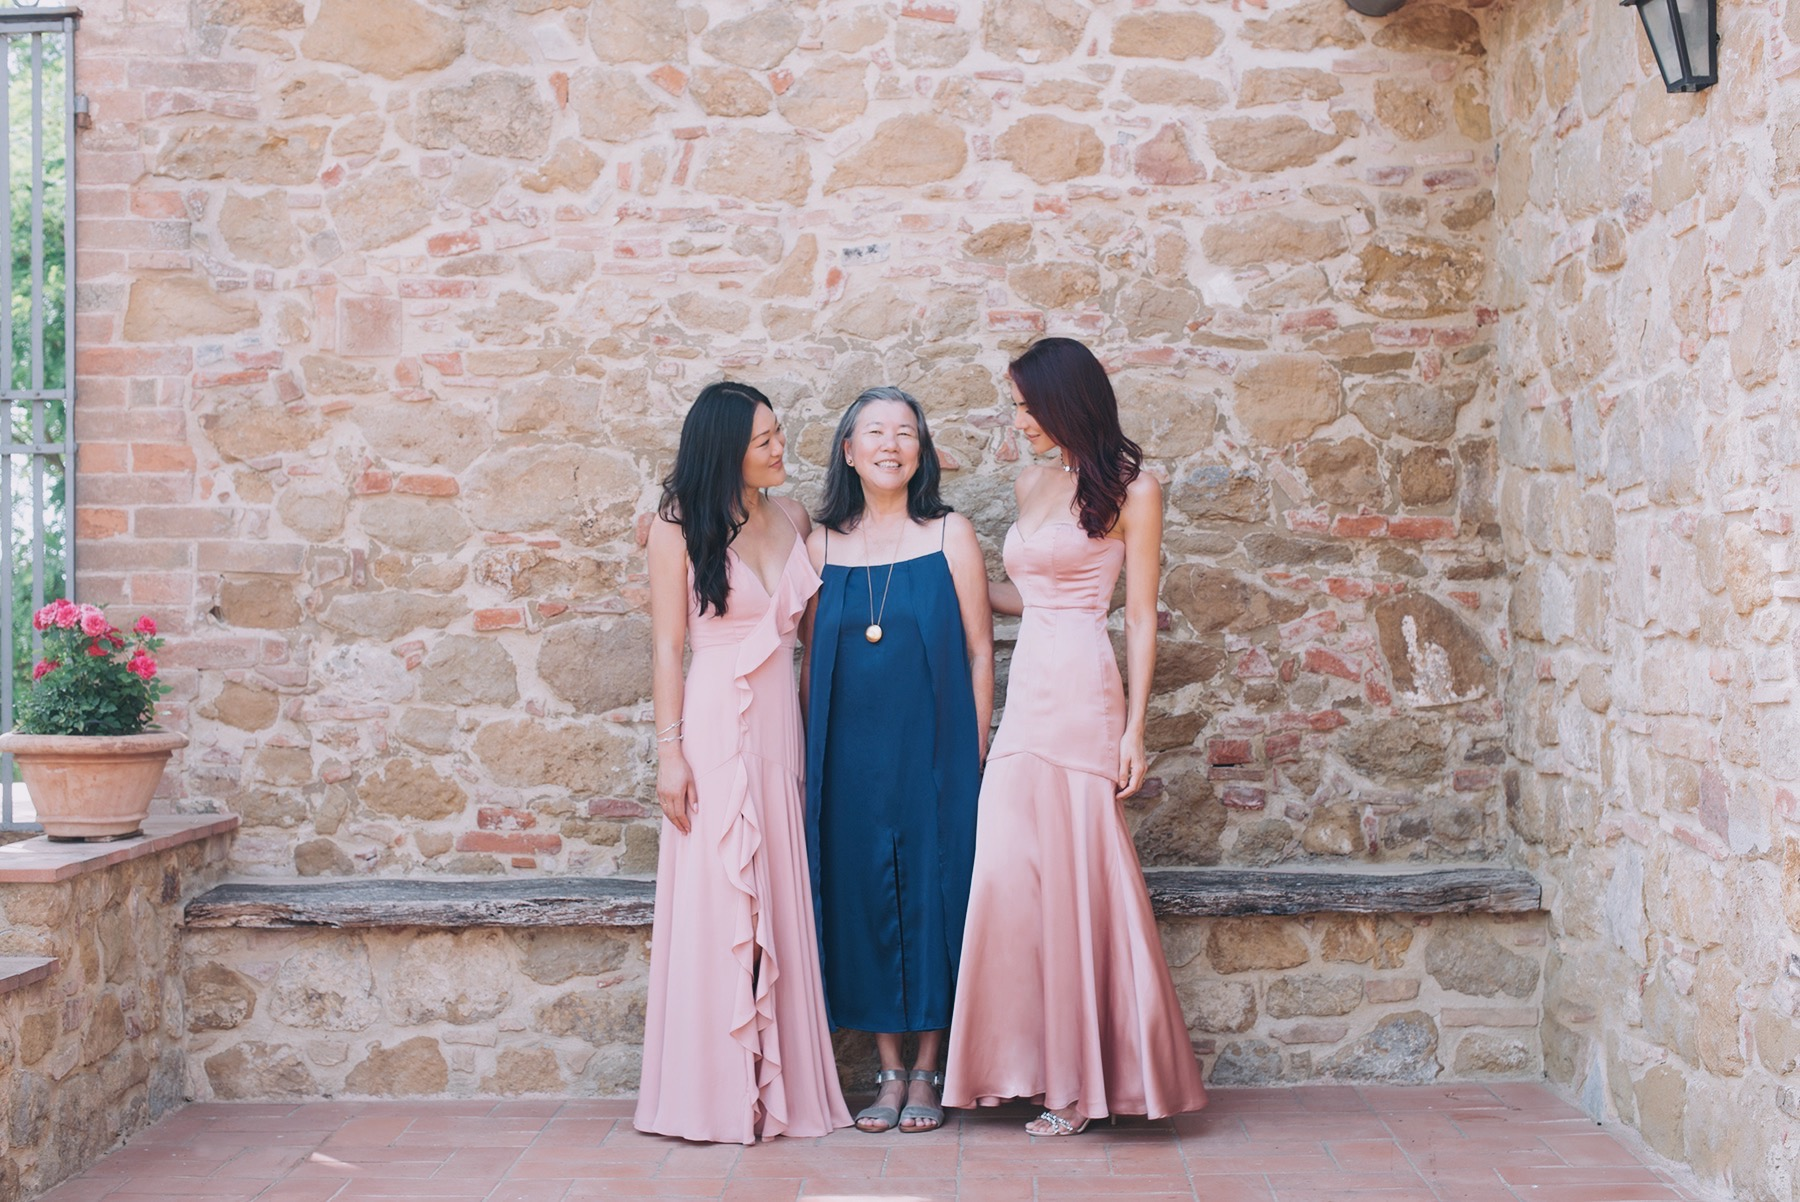 /   THE CALLAIS DRESS   /   THE MINUTIAE DRESS   /   THE NEBULA DRESS  /